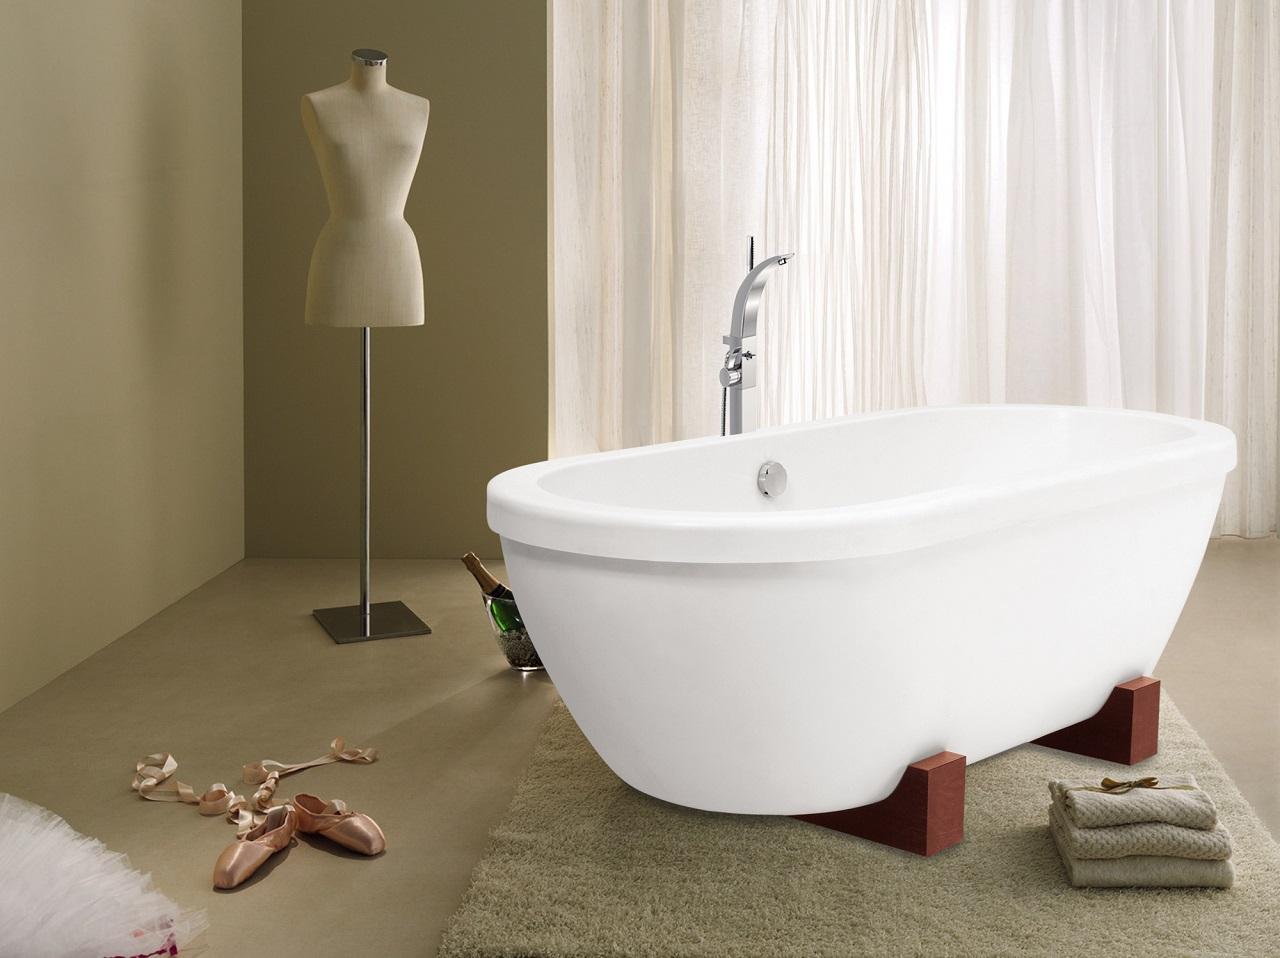 Aquatica AdoreMe-Wht Freestanding Light Weight Cast Stone Bathtub